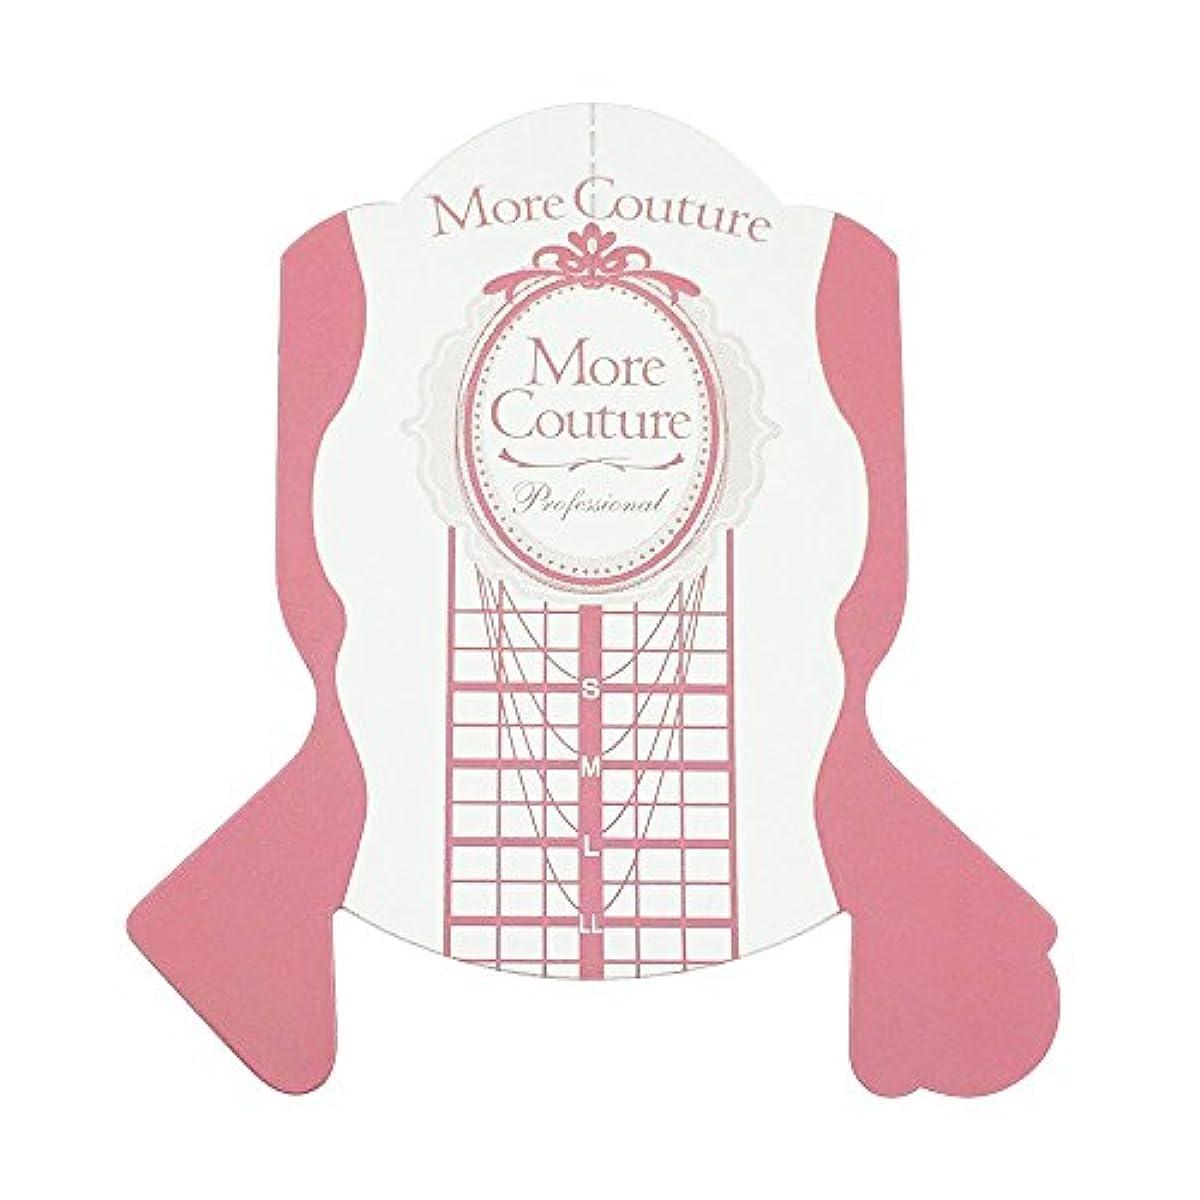 More Couture p ピンクフォーム 100枚 ネイルフォーム